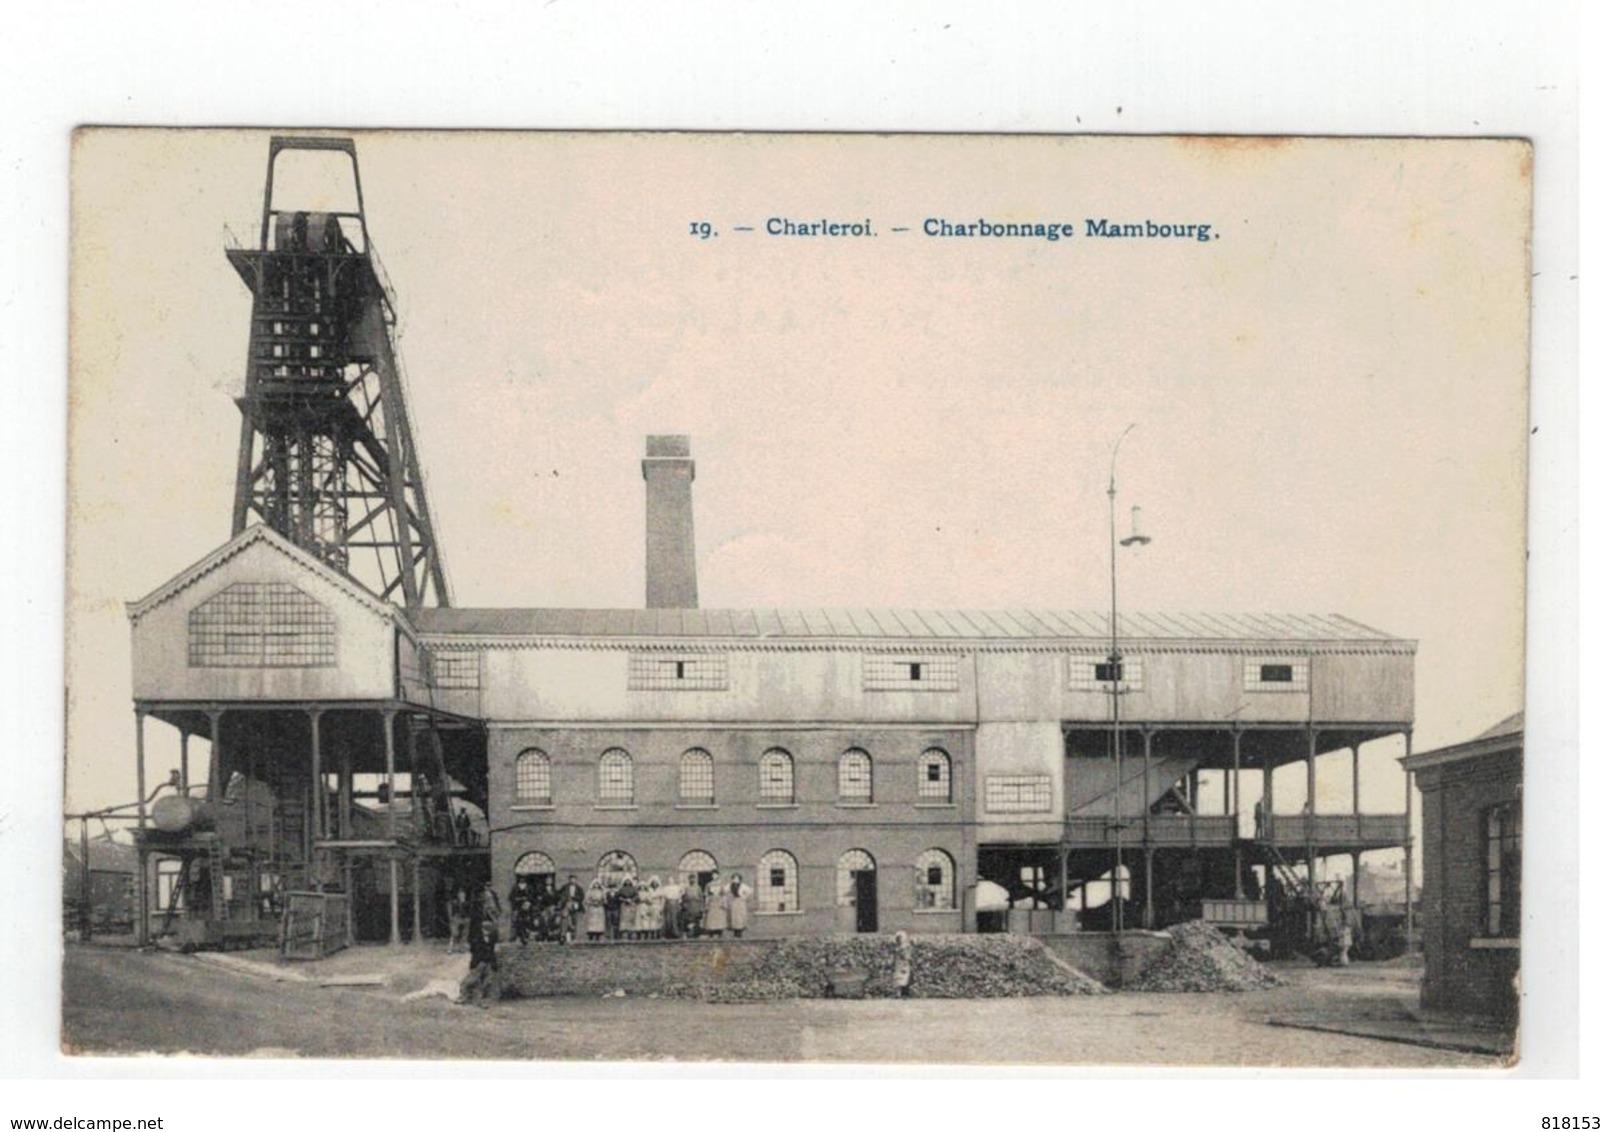 19.  - Charleroi - Charbonnage Mambourg - Charleroi